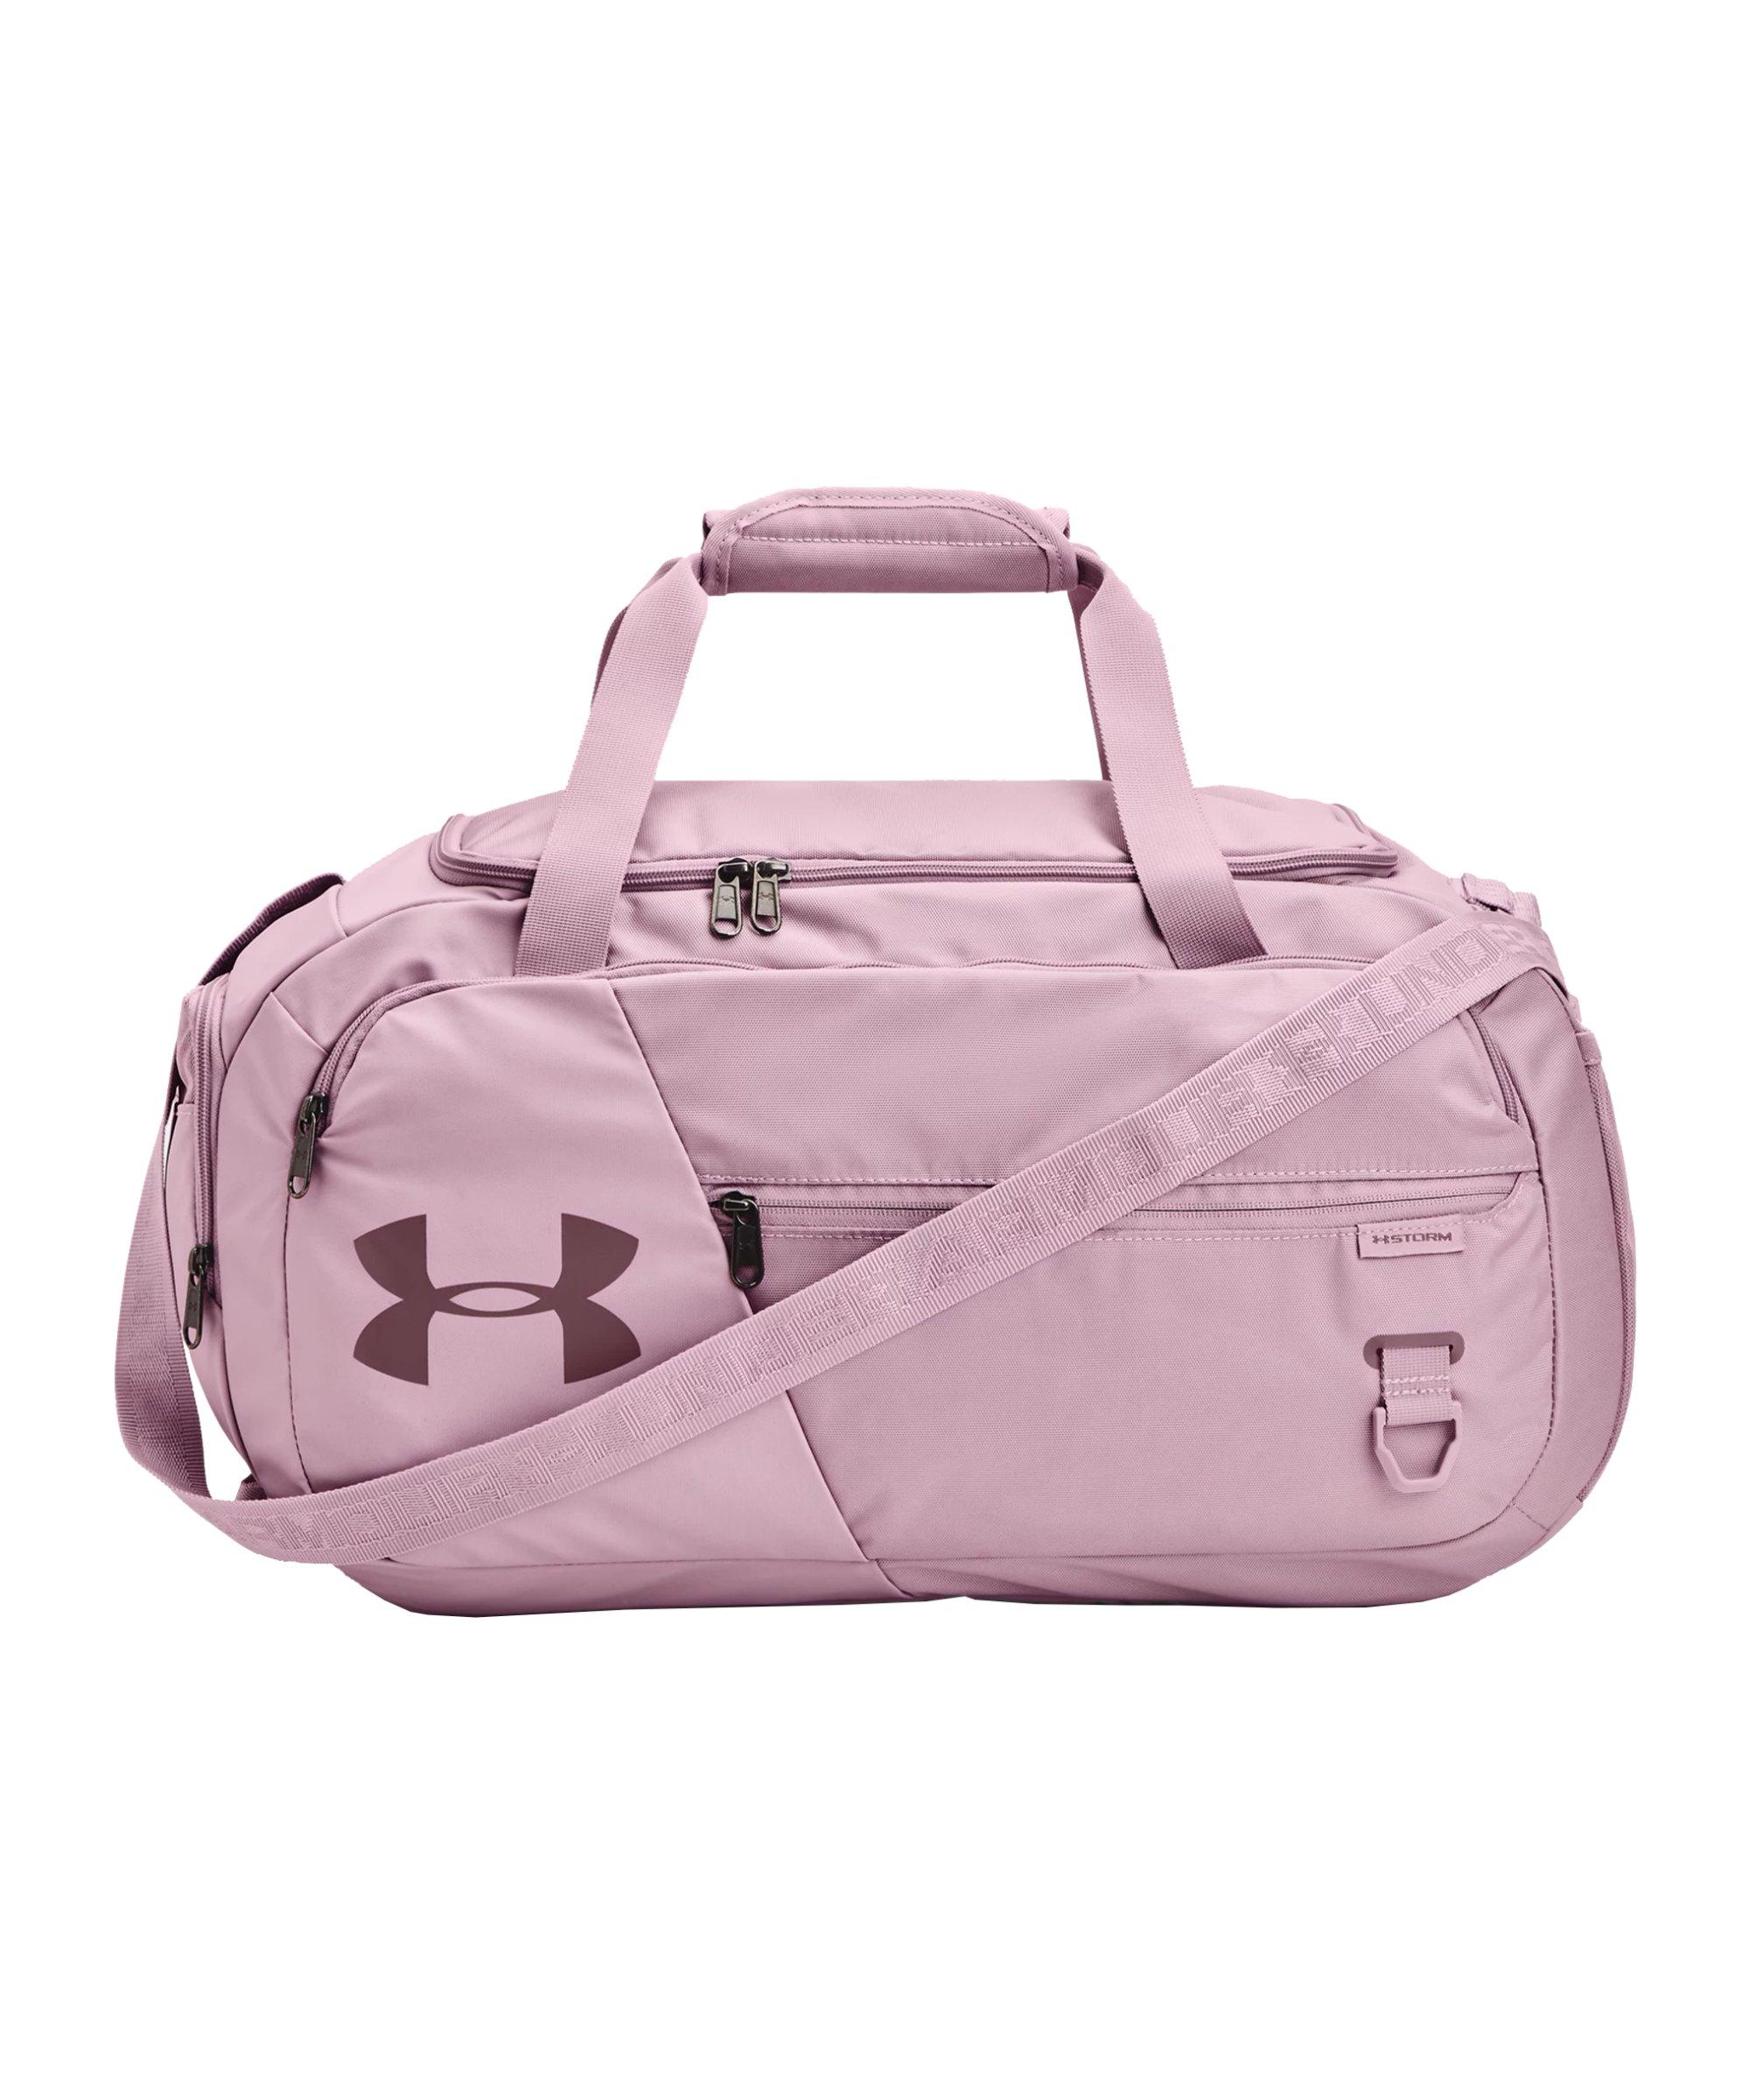 Under Armour Duffle 4.0 Sporttasche S Pink F698 - pink